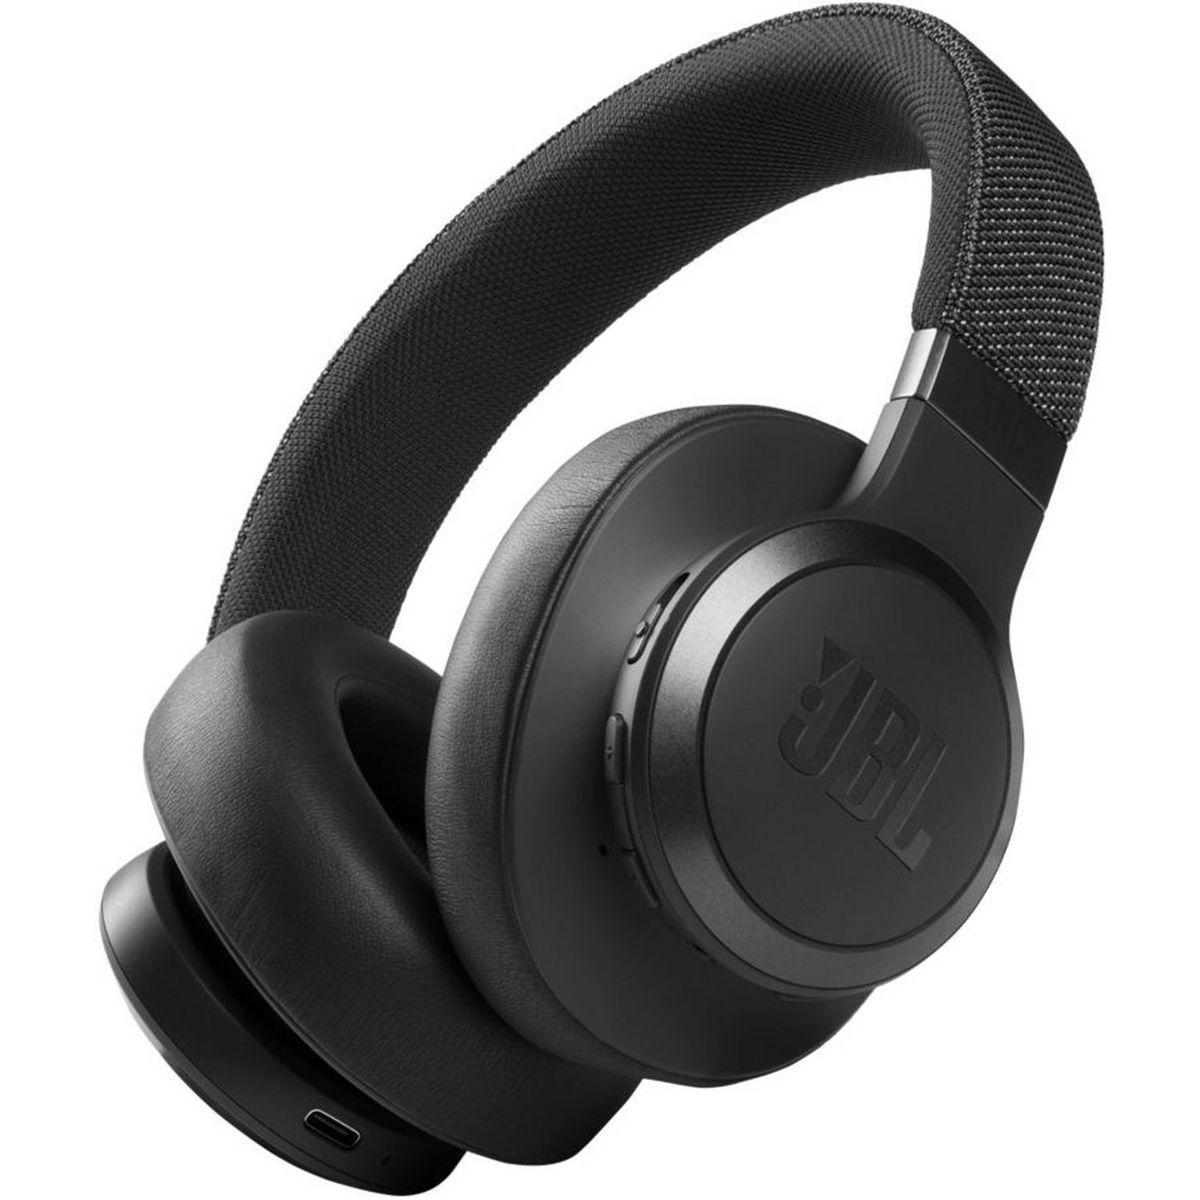 Casque audio Bluetooth - Live 660NC - Noir